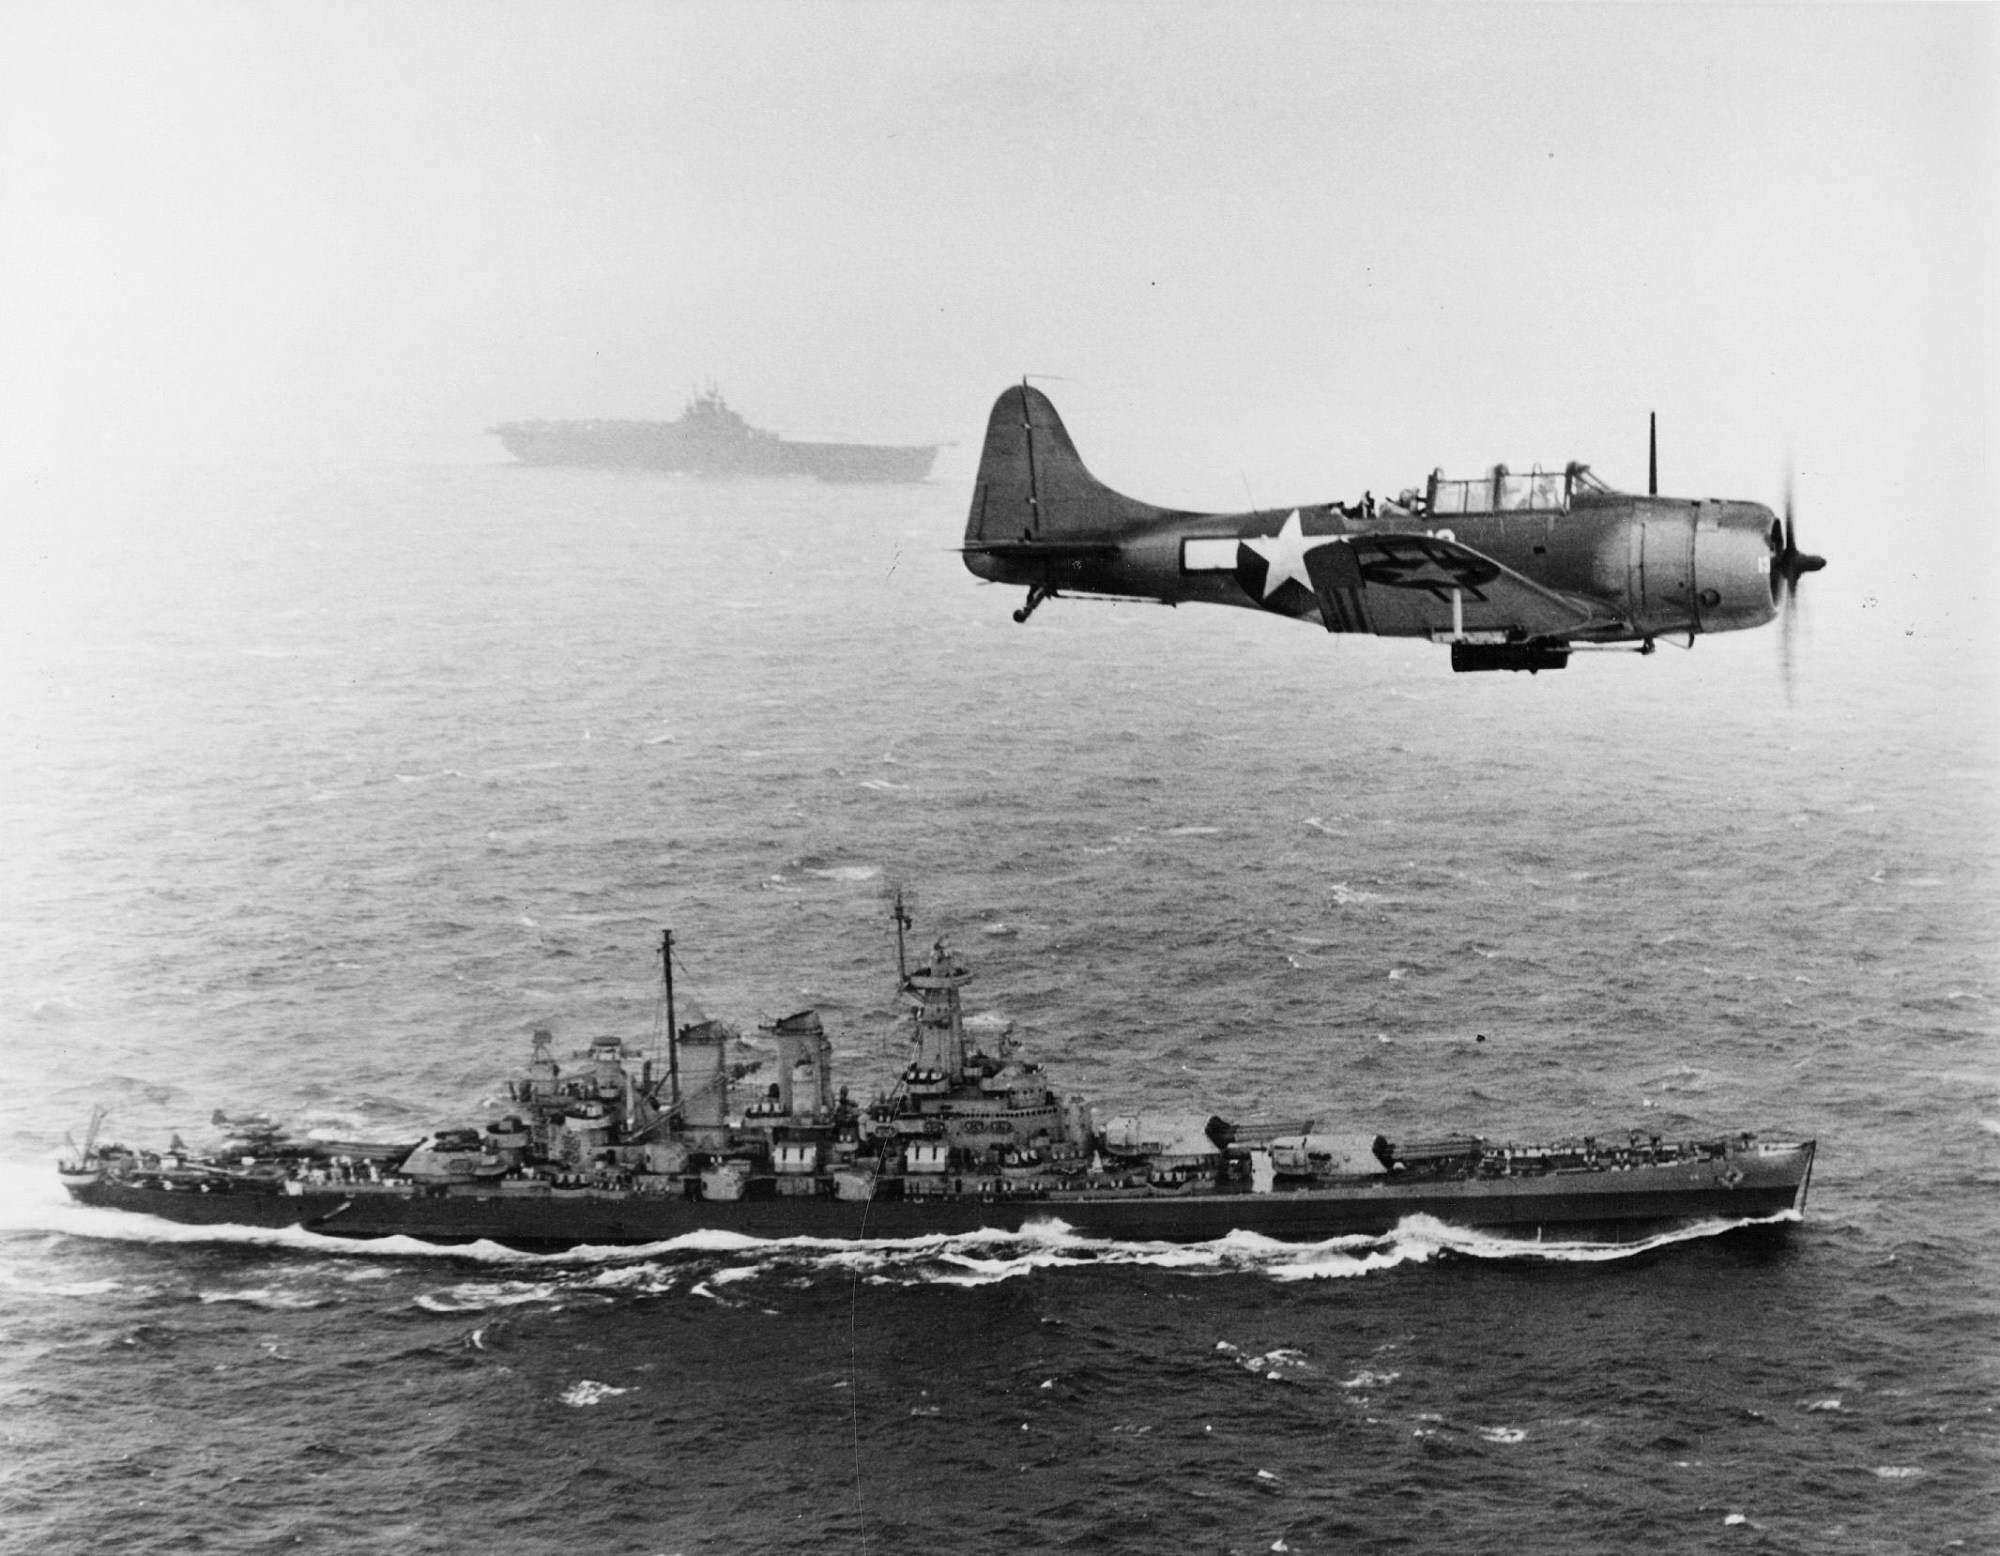 douglas sbd 5 dauntless over uss washington - Un Douglas SBD-5 Dauntless passe au dessus de l'USS Washington